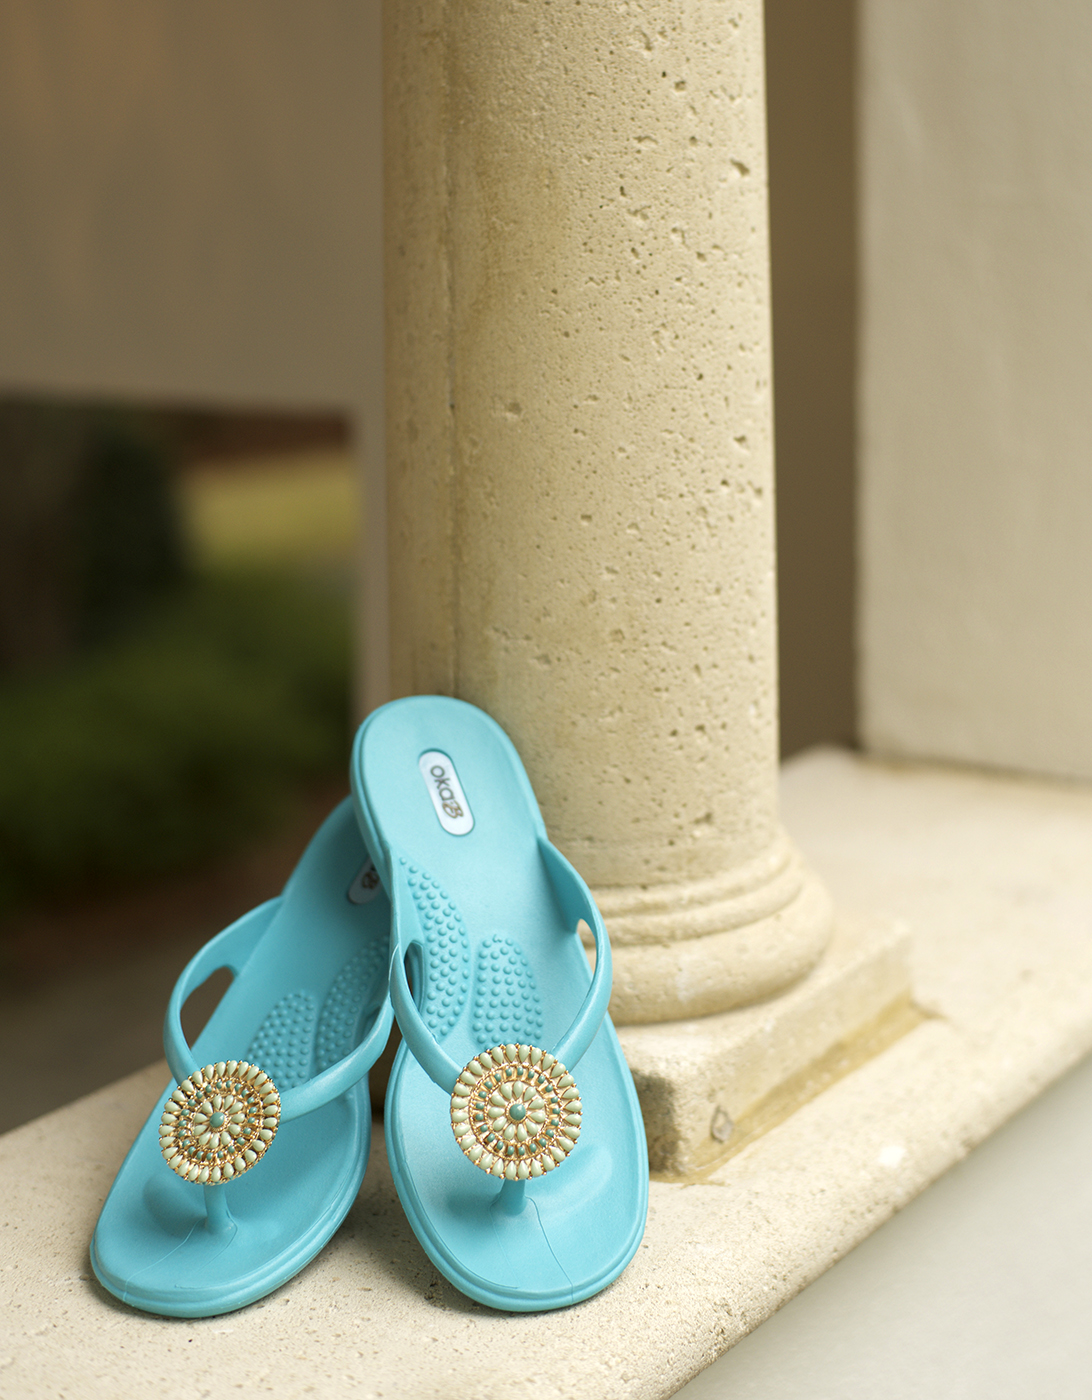 5df31876c502e  OkaBLovesYou  WeddingDayGiveaway  OkaB  Sweepstakes  Wedding  Shoes   Bridal  Bridesmaids  Flats  Sandals  FlipFlops